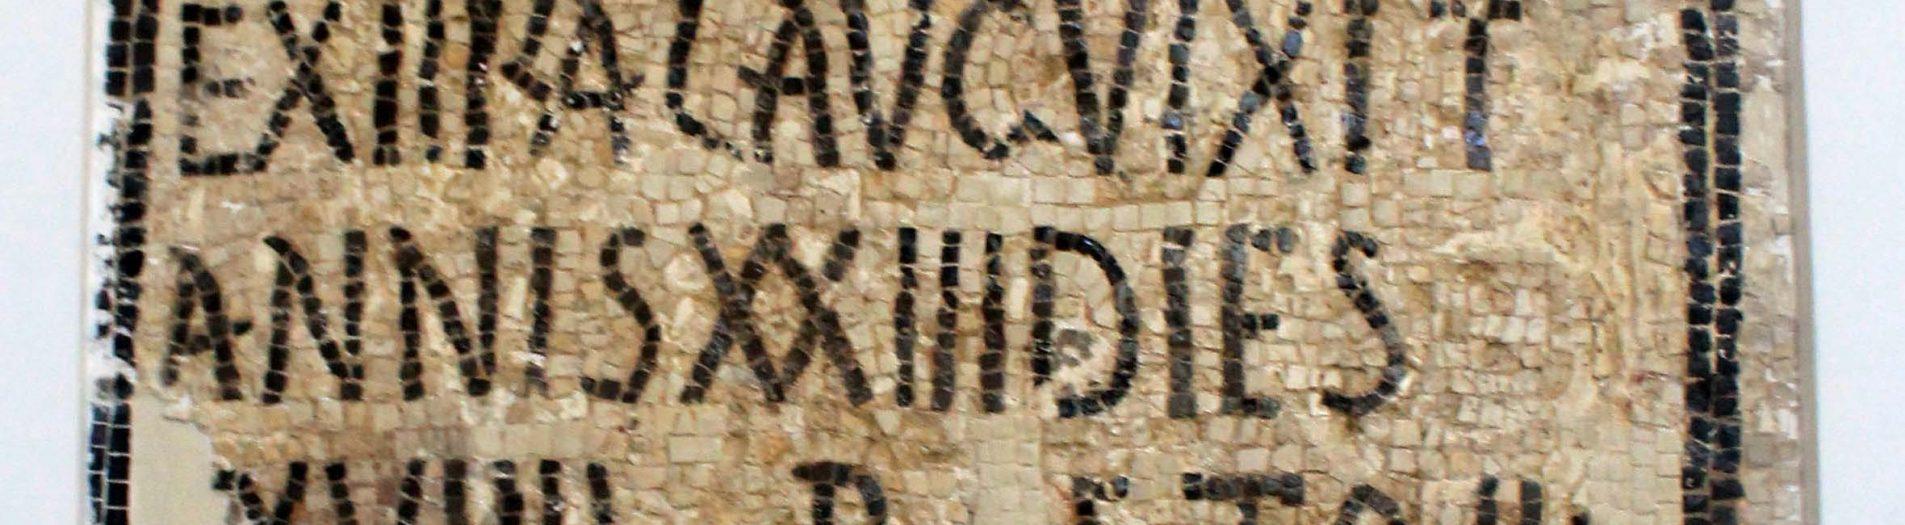 Ecritures de la Tunisie